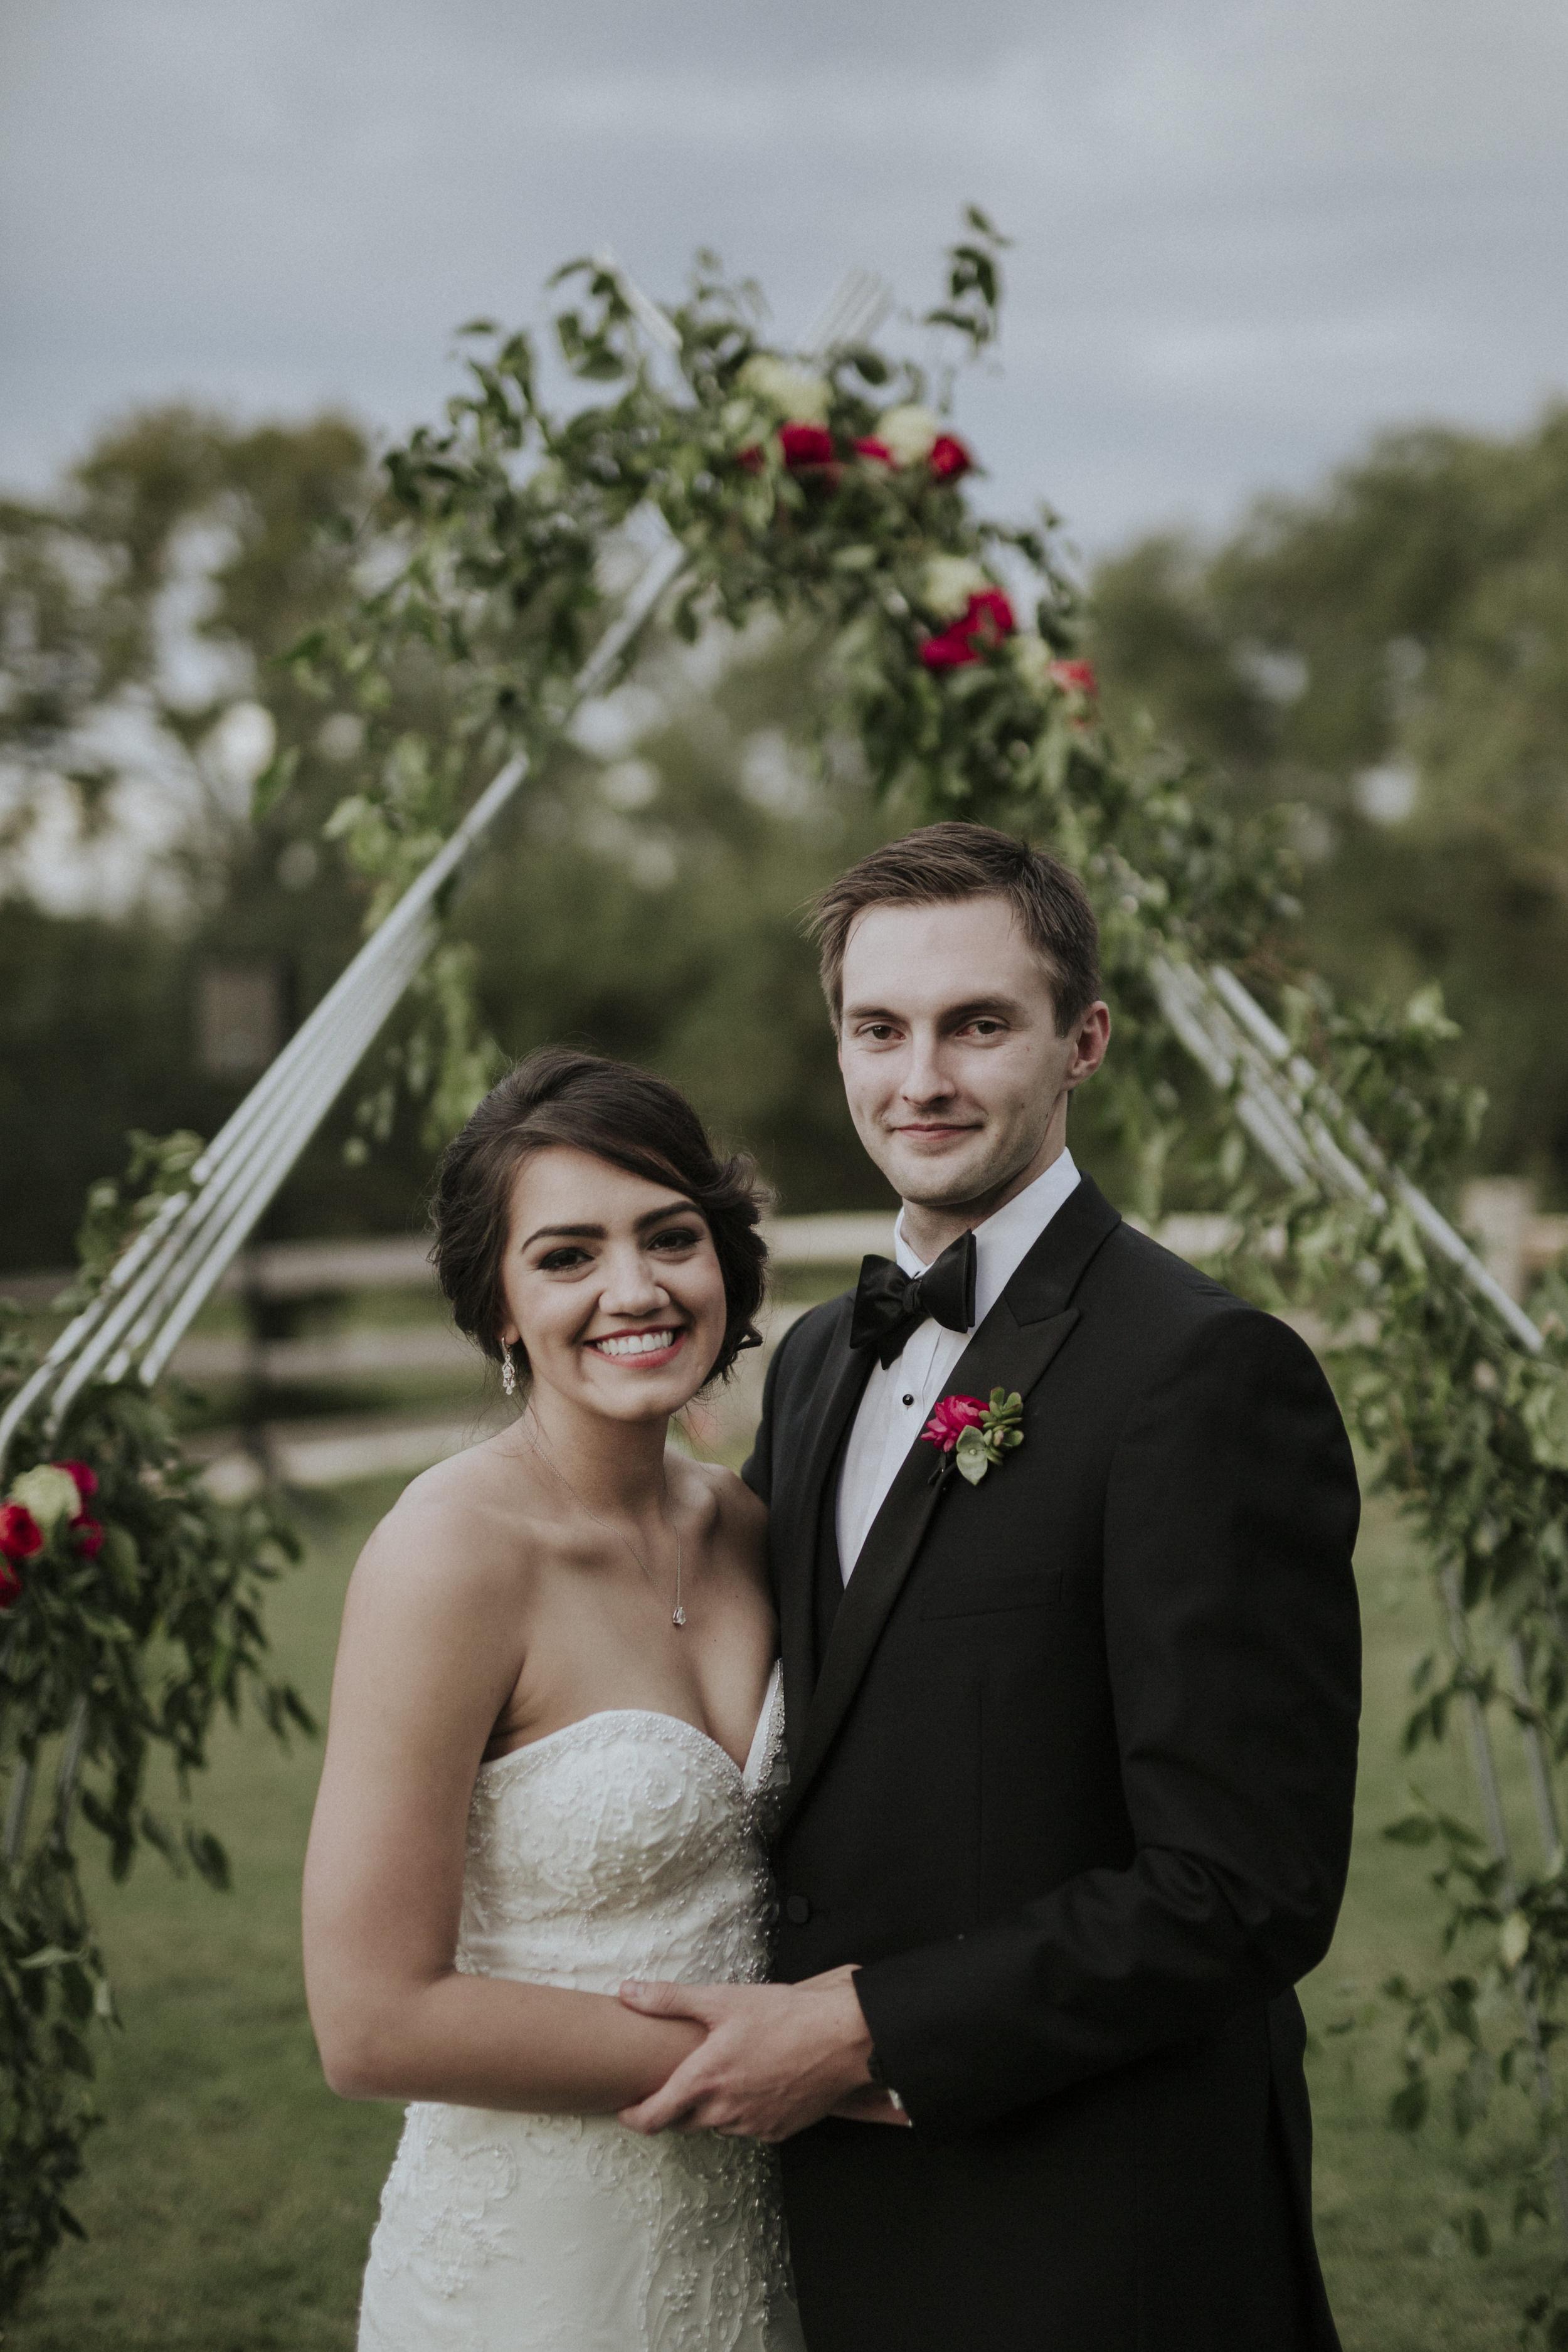 Garden Grove Wedding & Event Center5727.JPG